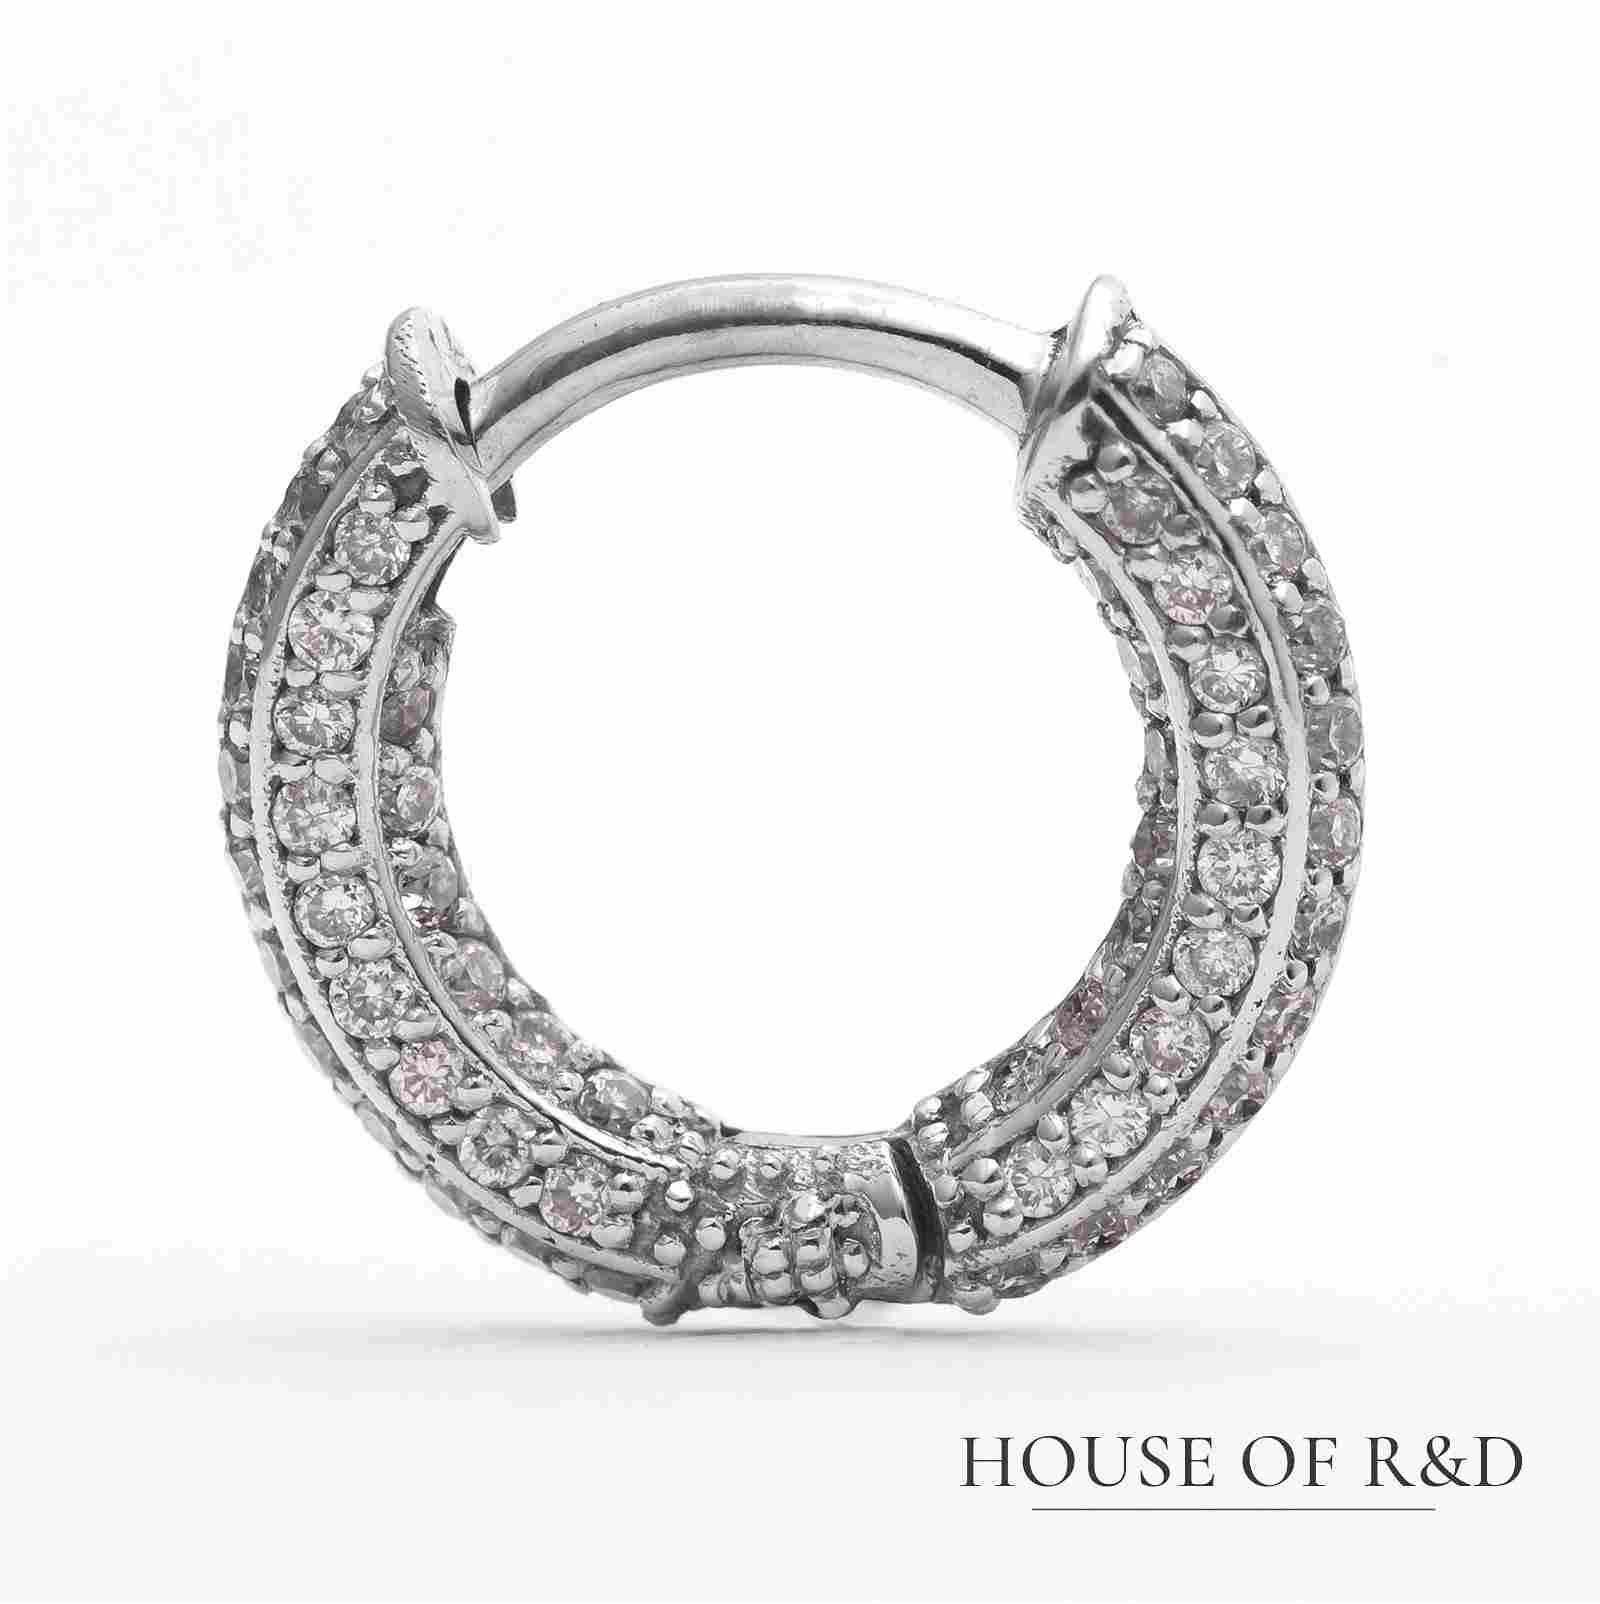 14k White Gold - 0.23tcw -  Diamonds Earring